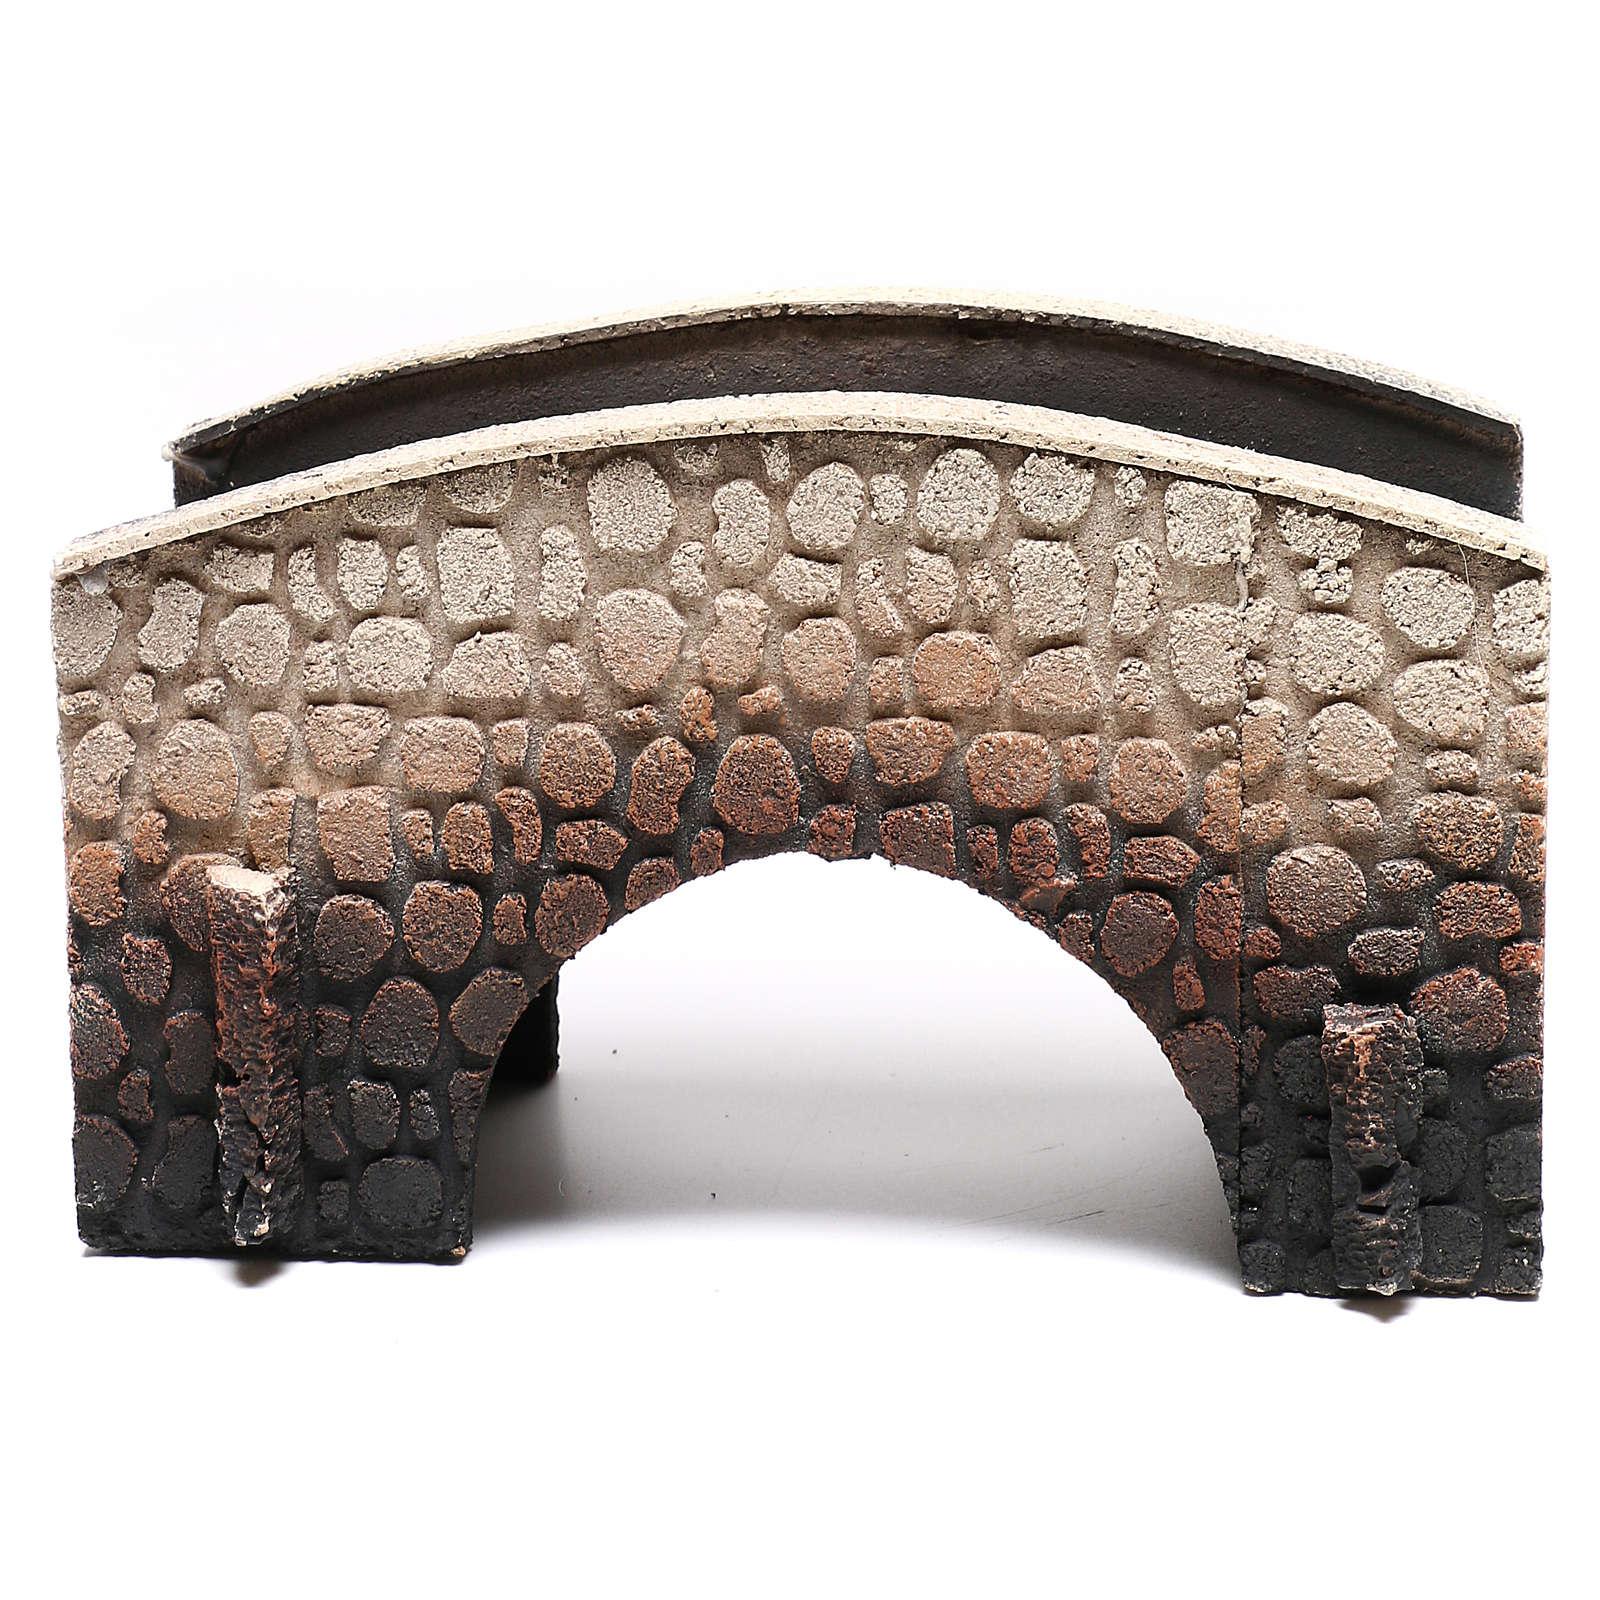 Ponte presepe sughero arcuato 16x25x11 cm 4